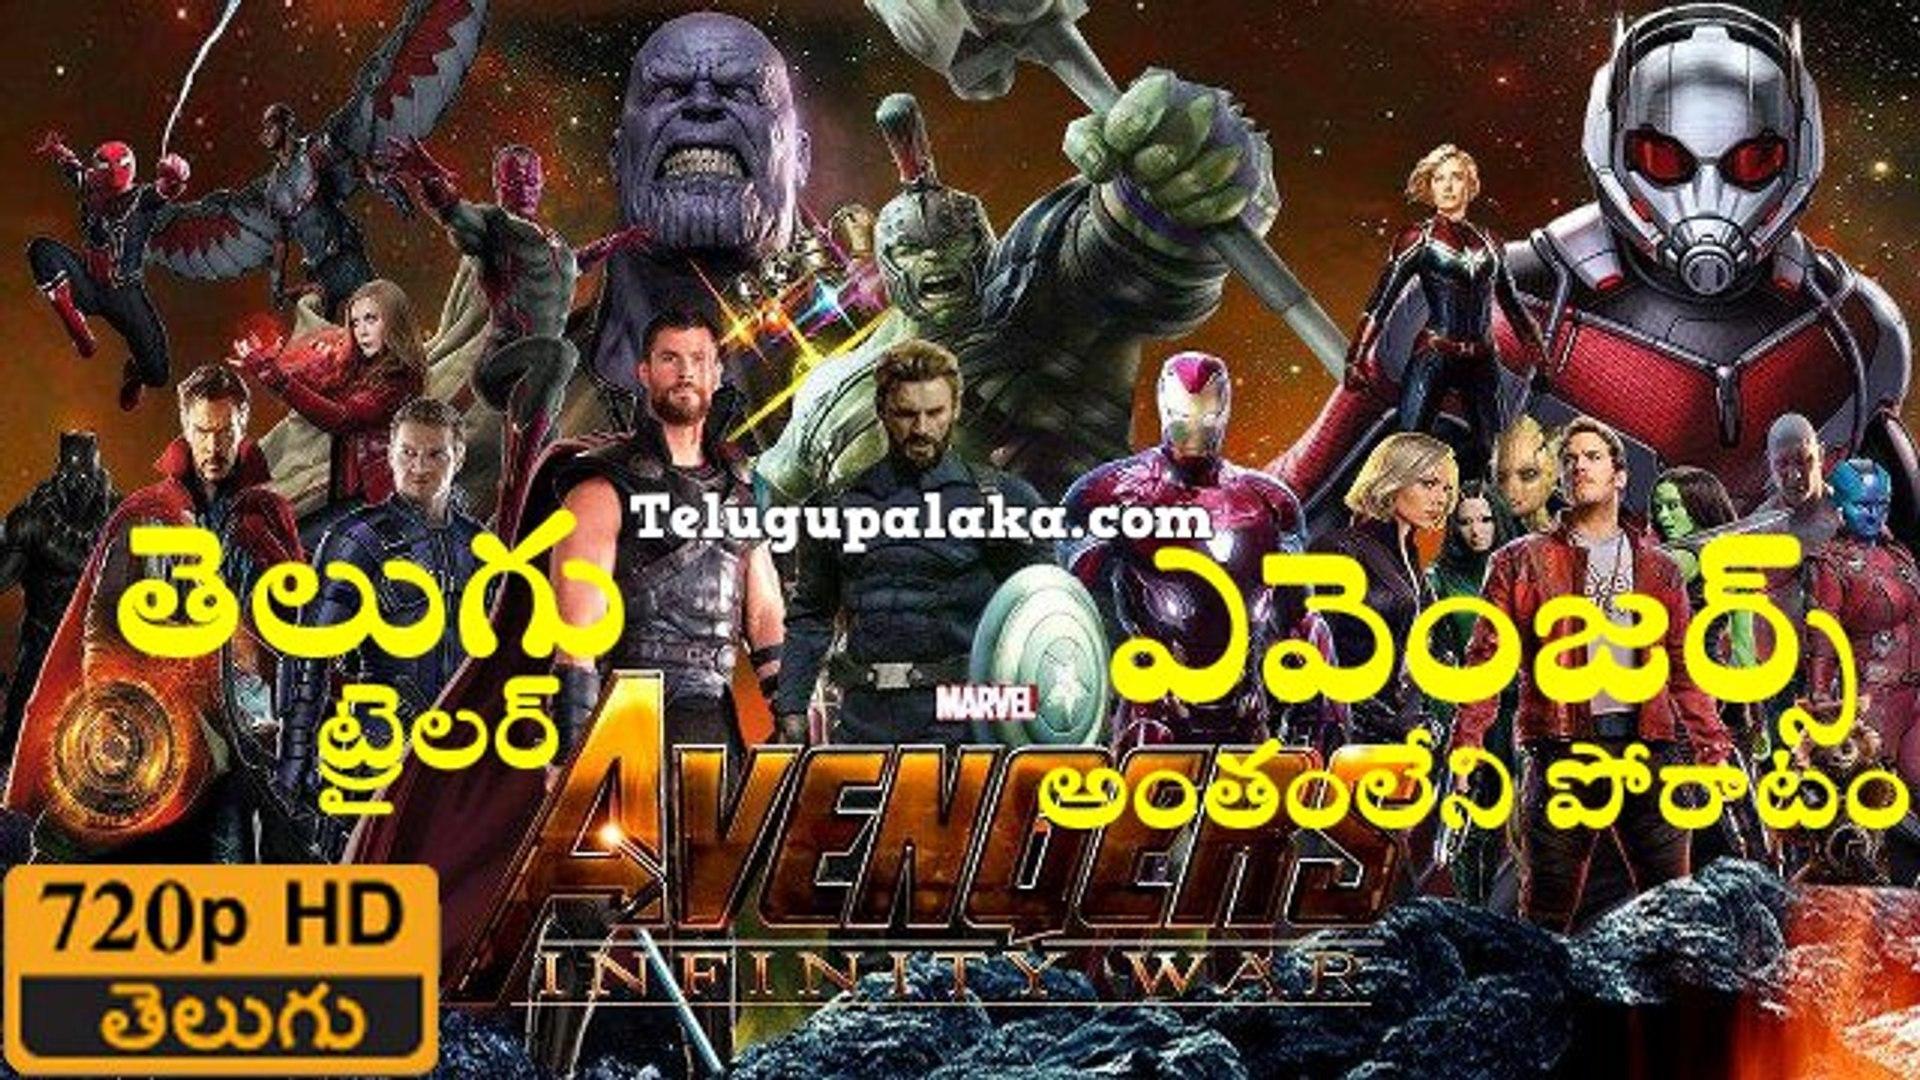 Avengers Infinity War 2018 Telugu Dubbed Trailer Watch Online